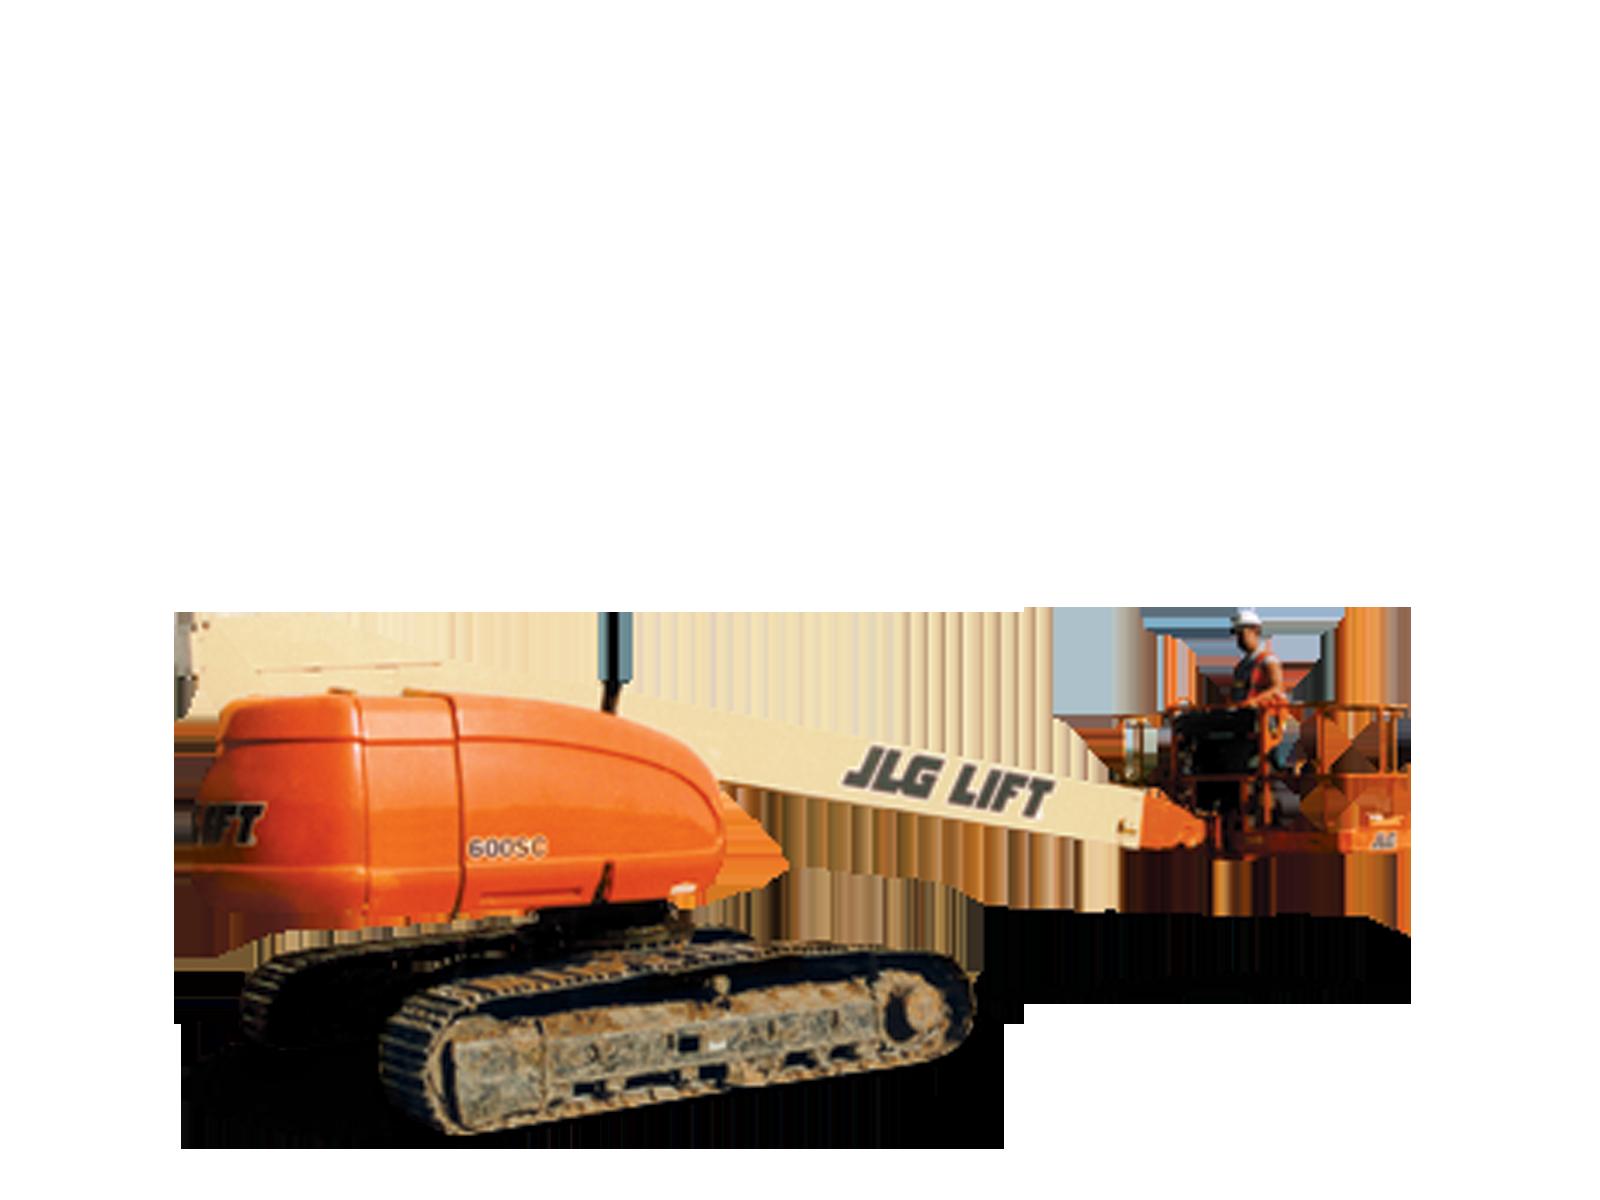 JLG Telescopic Crawler Boom Lift 600SC